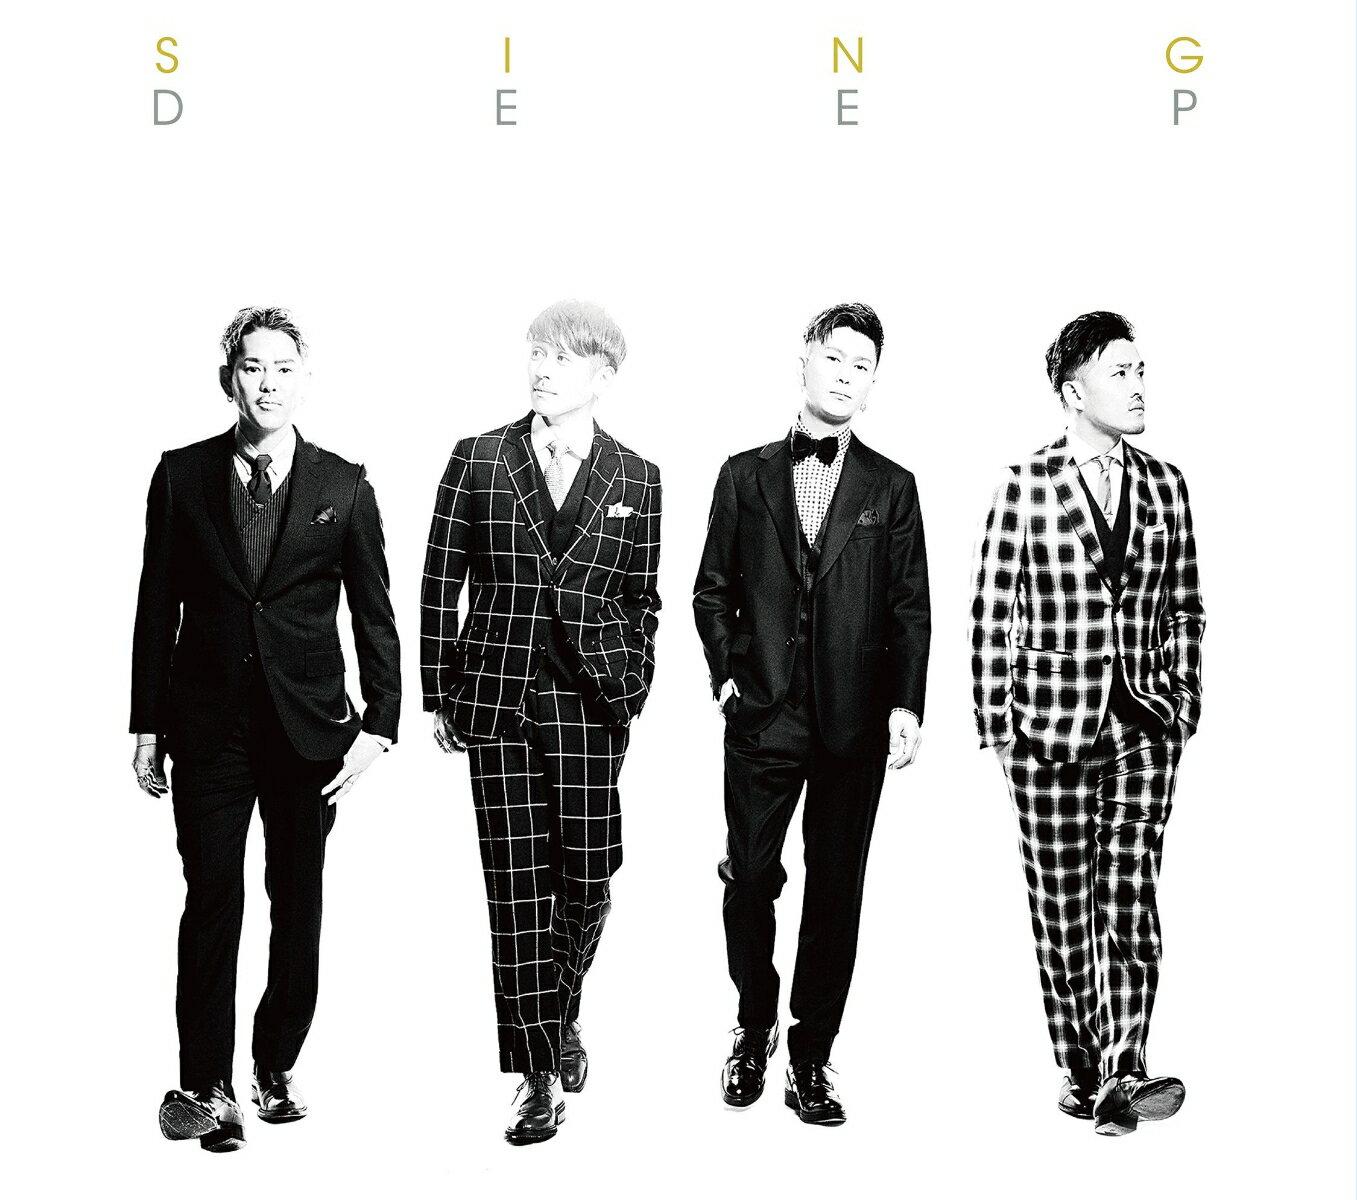 SING (初回限定盤 CD+DVD) [ DEEP ]